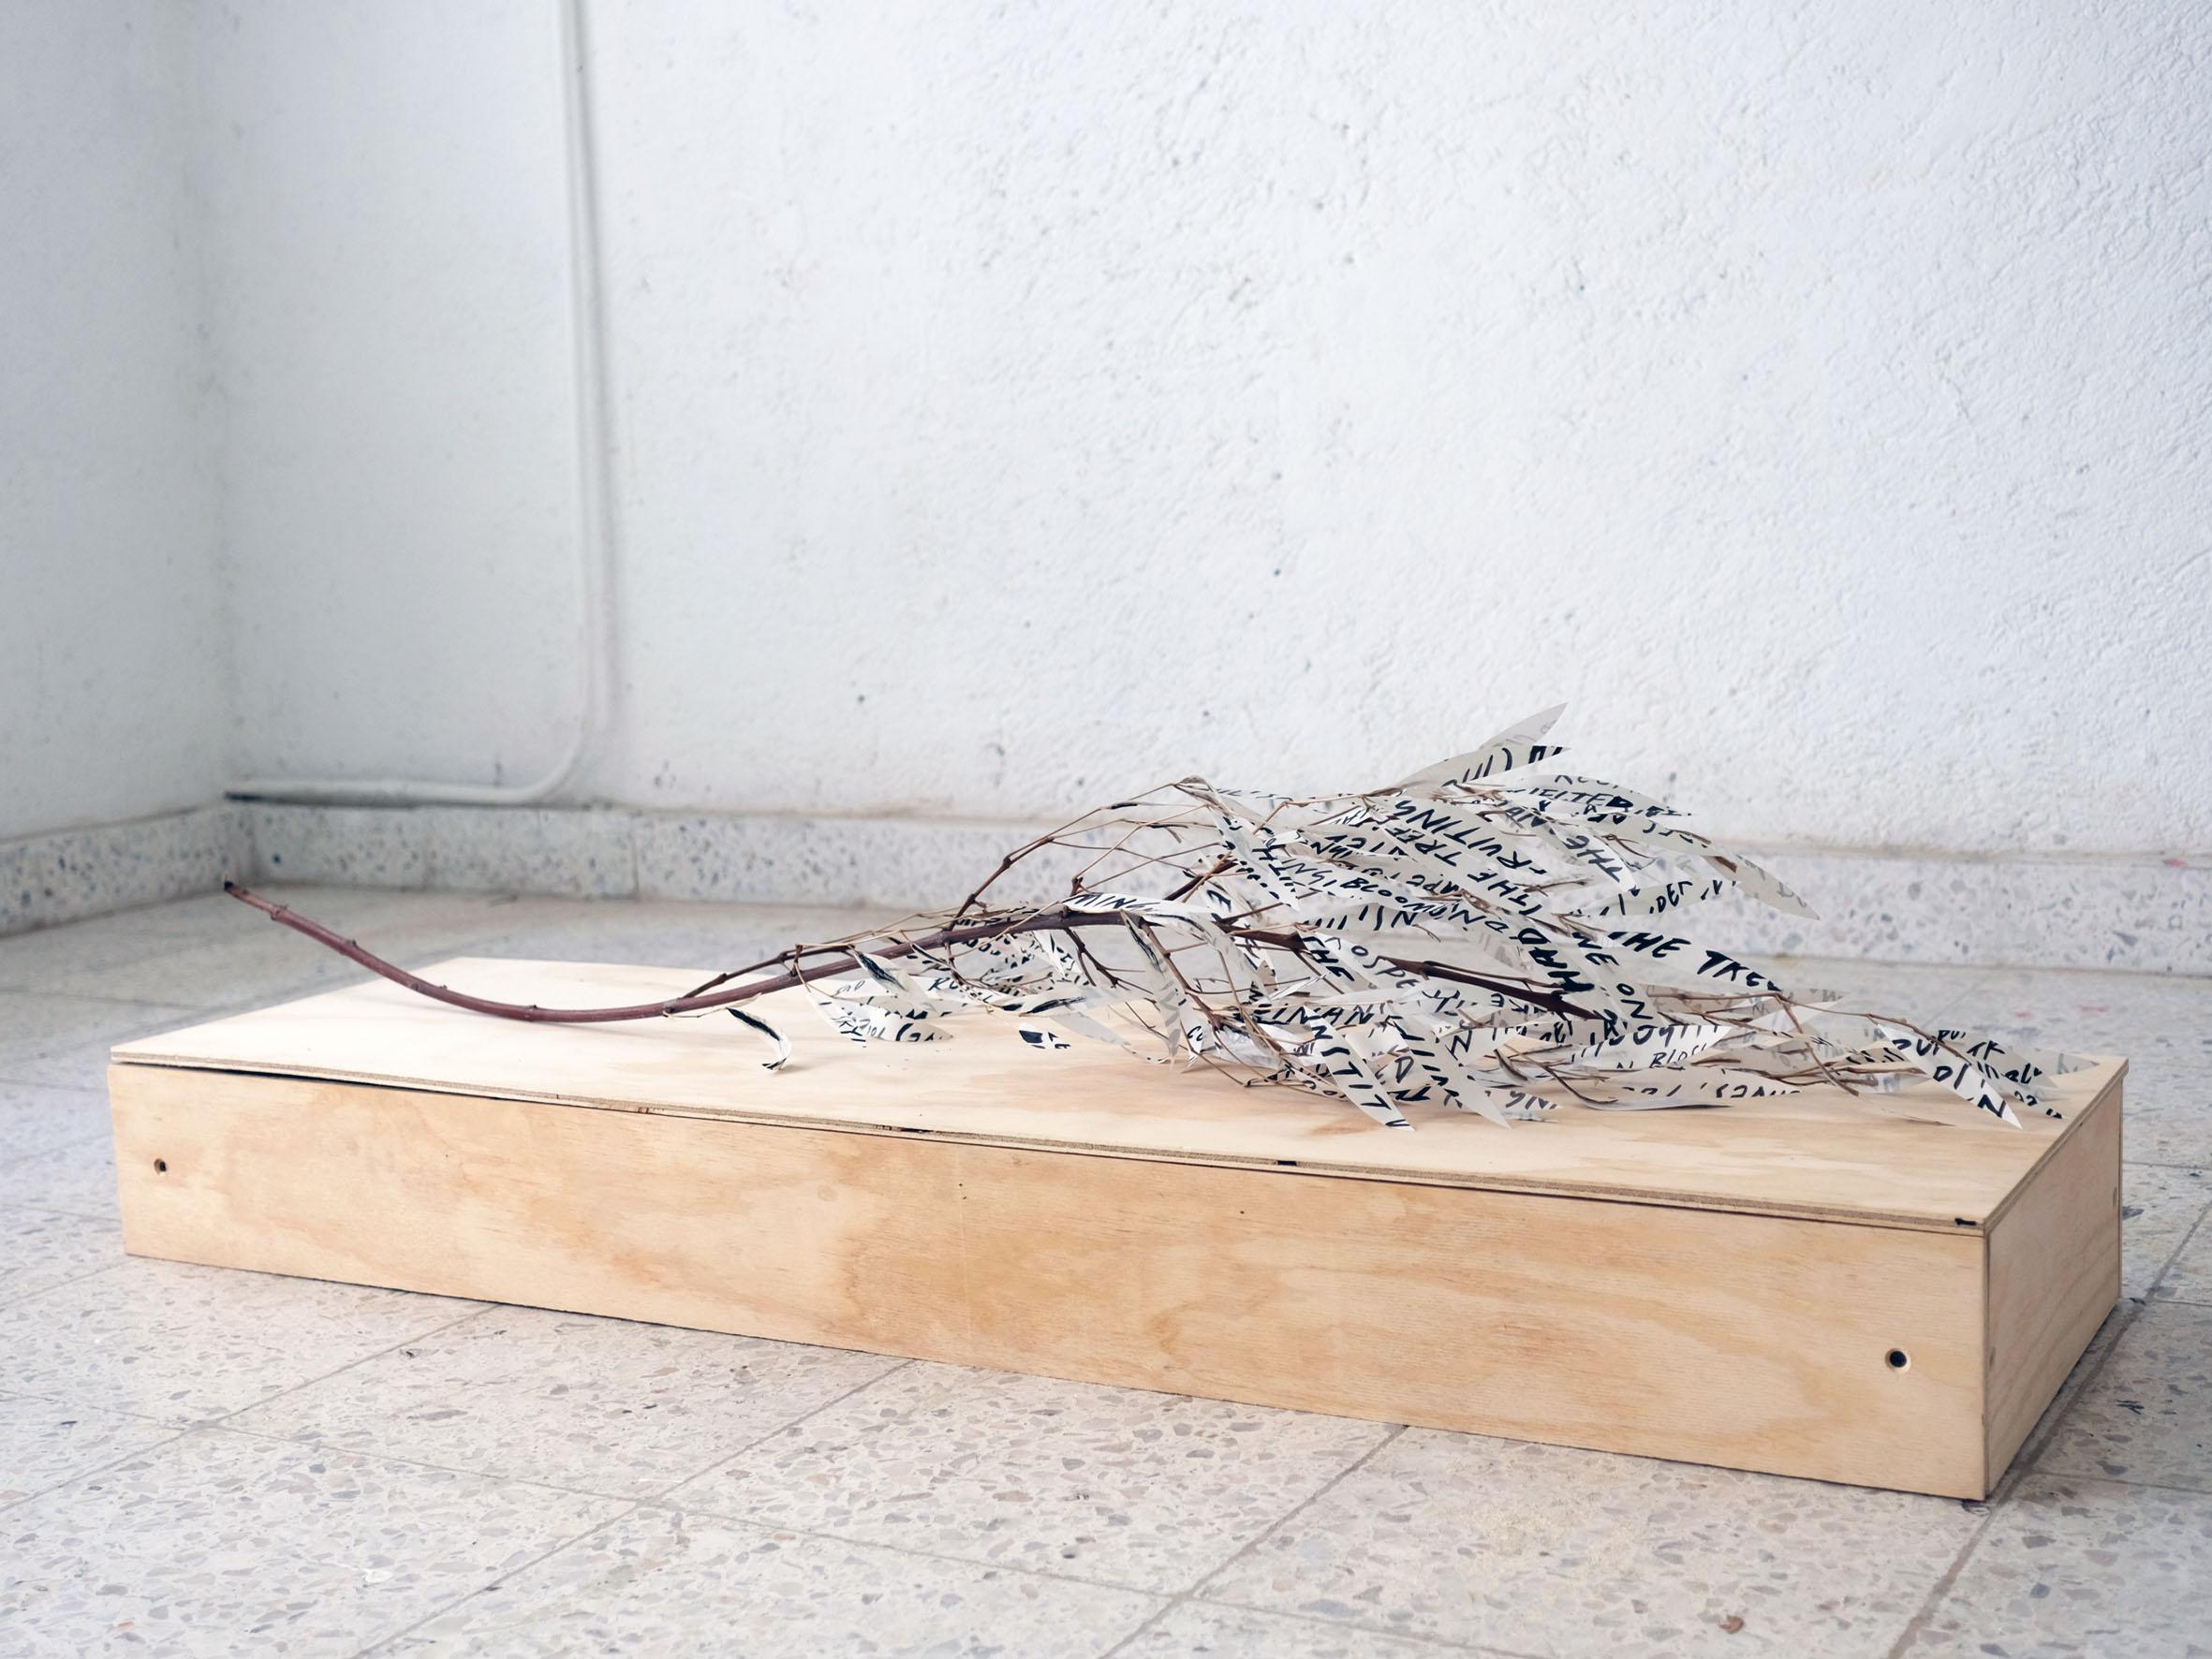 Charlie Godet Thomas, The Soft-Dying Day, 2020. Acrylic on newsprint, branch, glue, screws, timber. 133 x 35 x 36 cm.